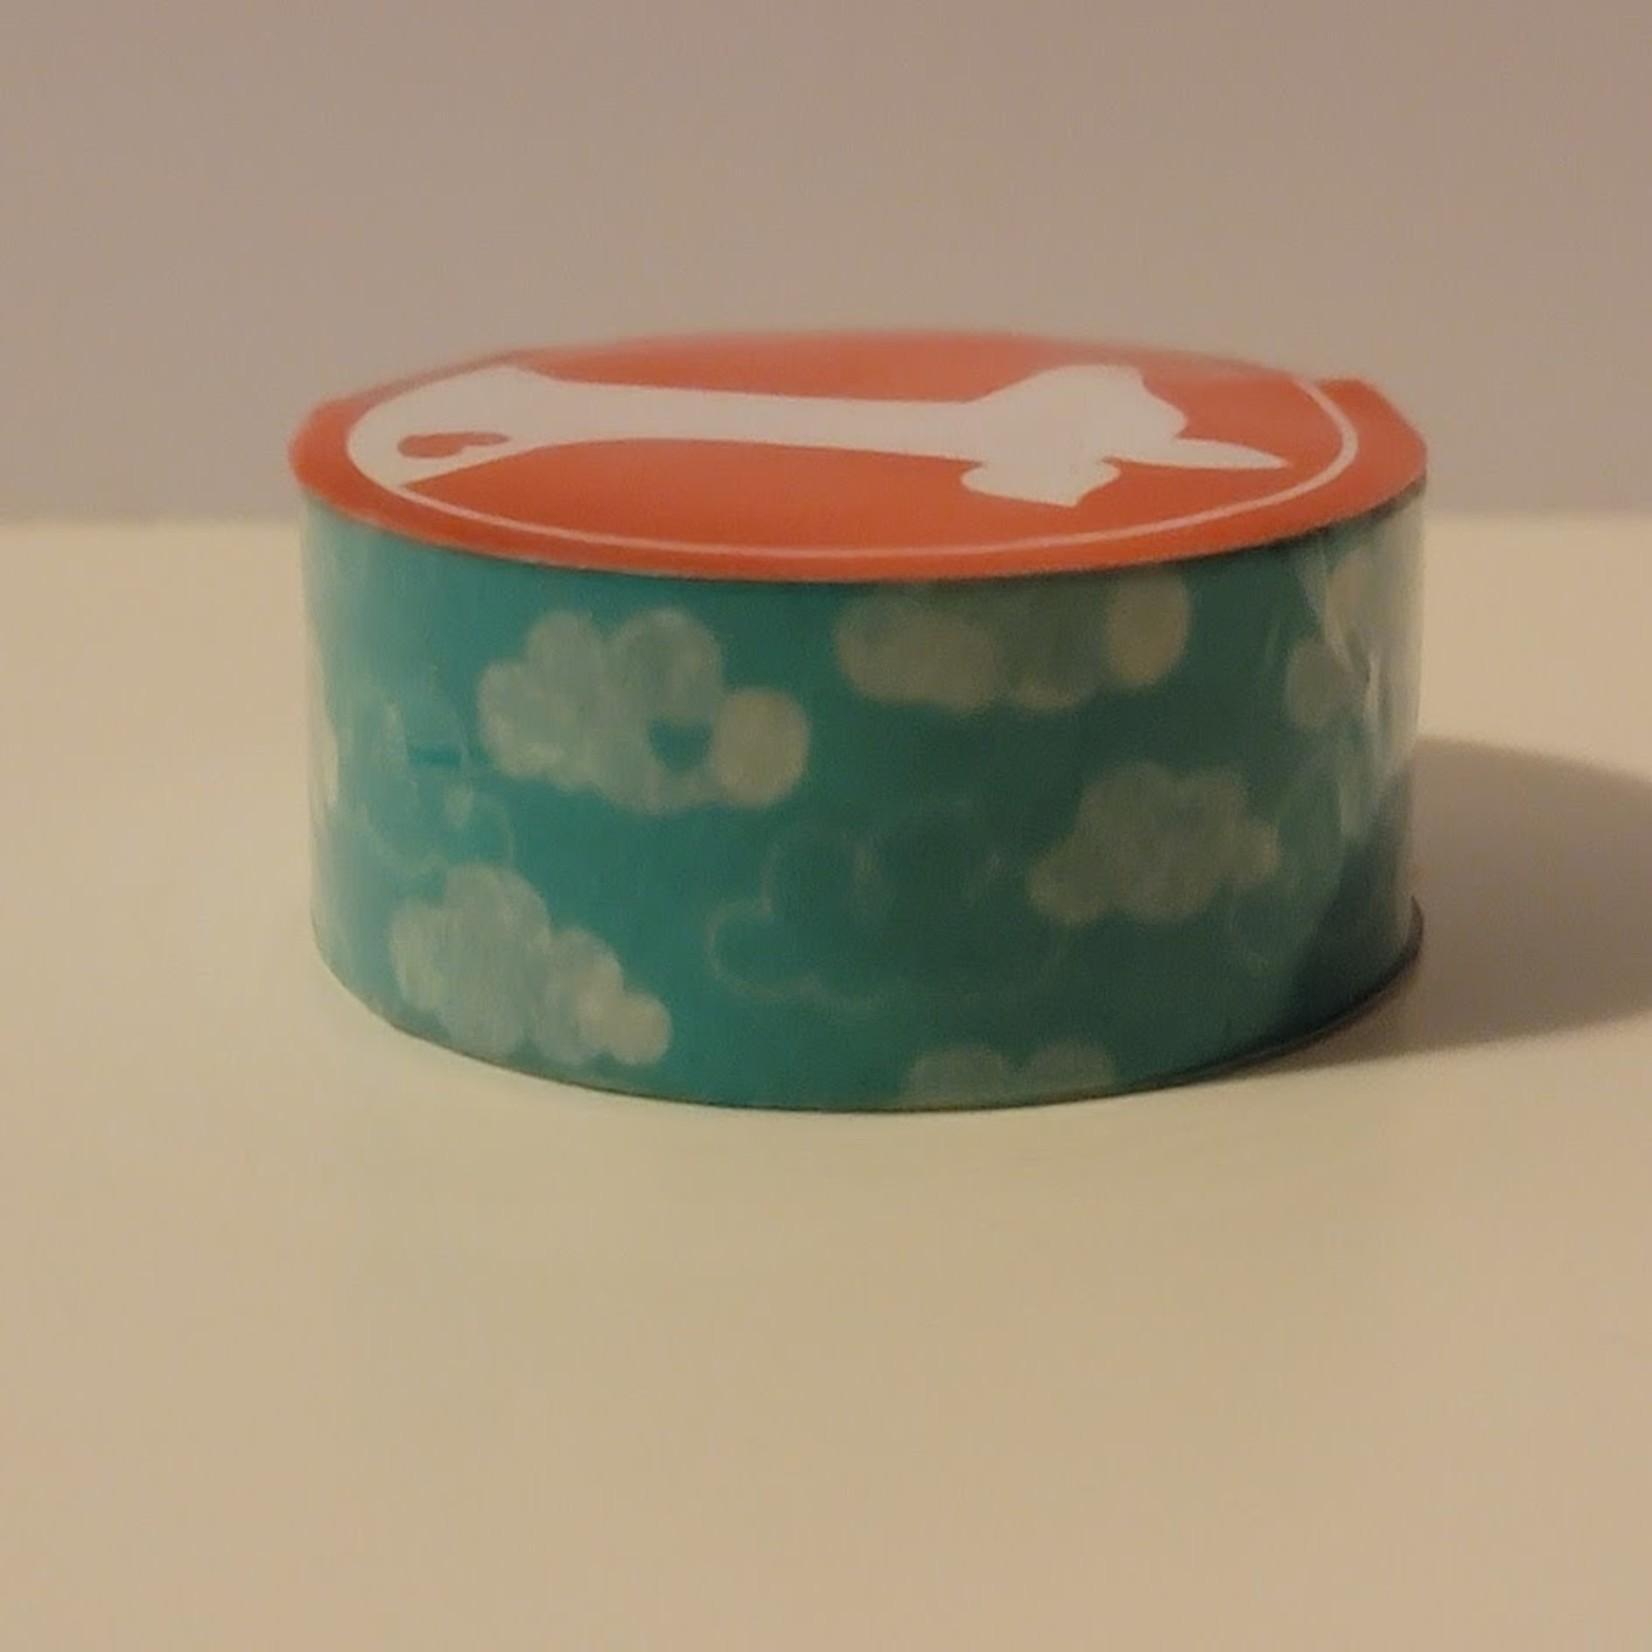 American Crafts FreckledFawn - Washi Tape - Clouds